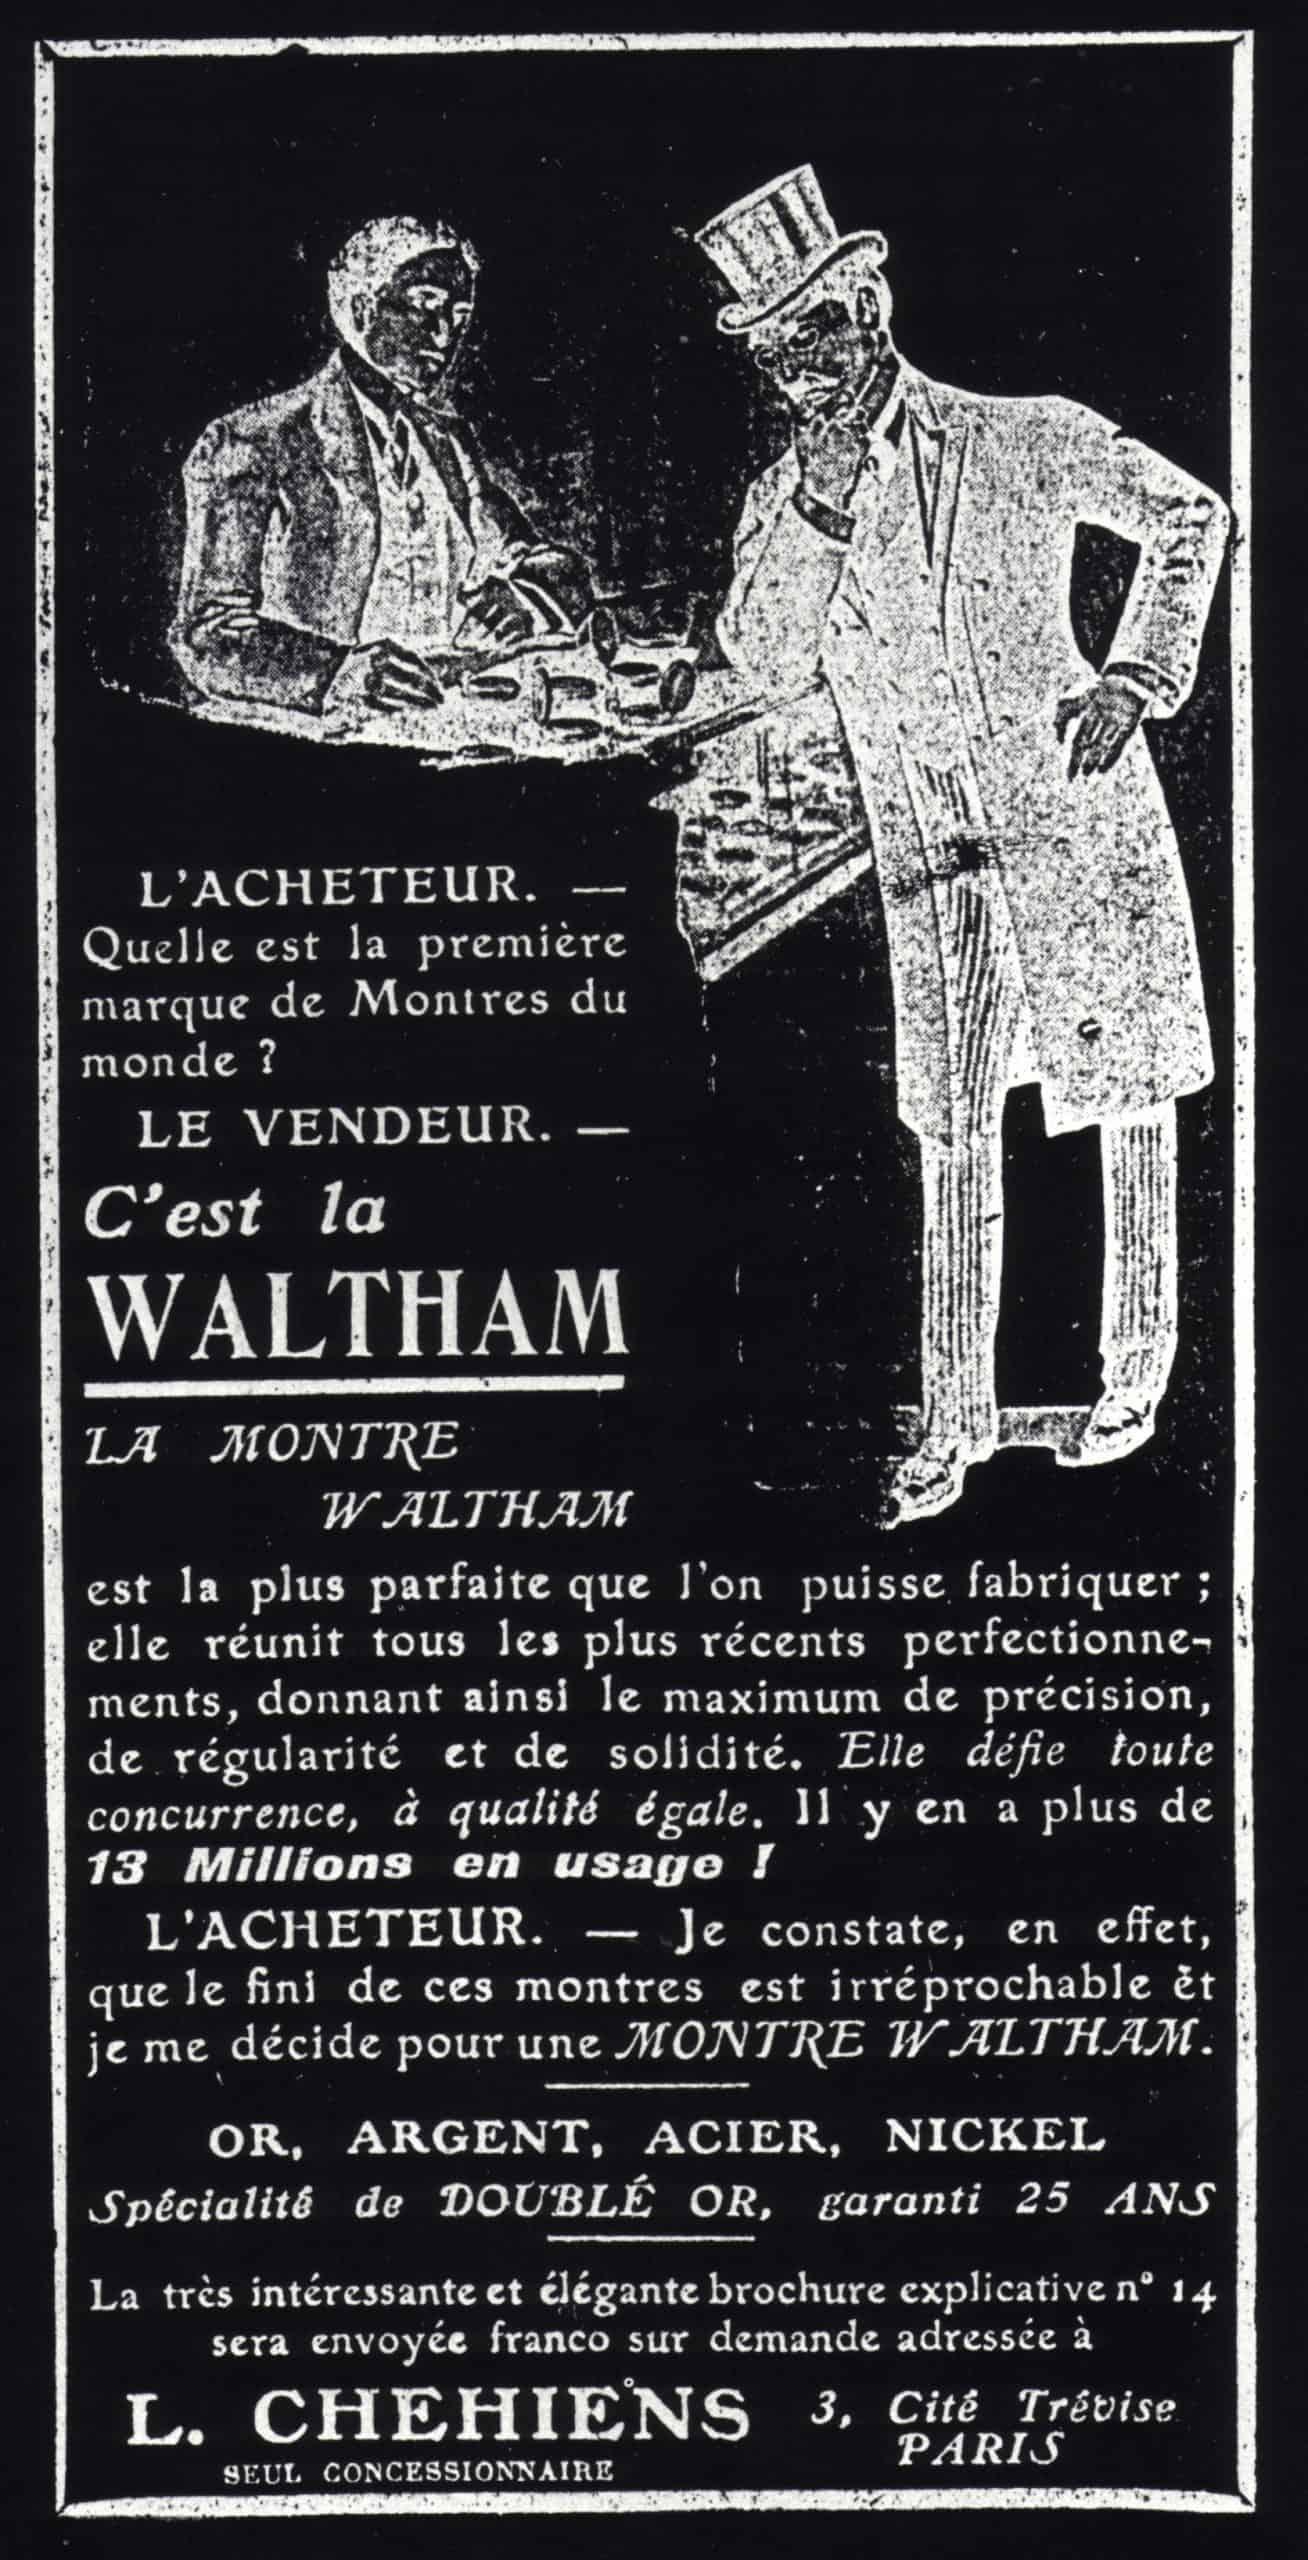 American Waltham Inserat 1907